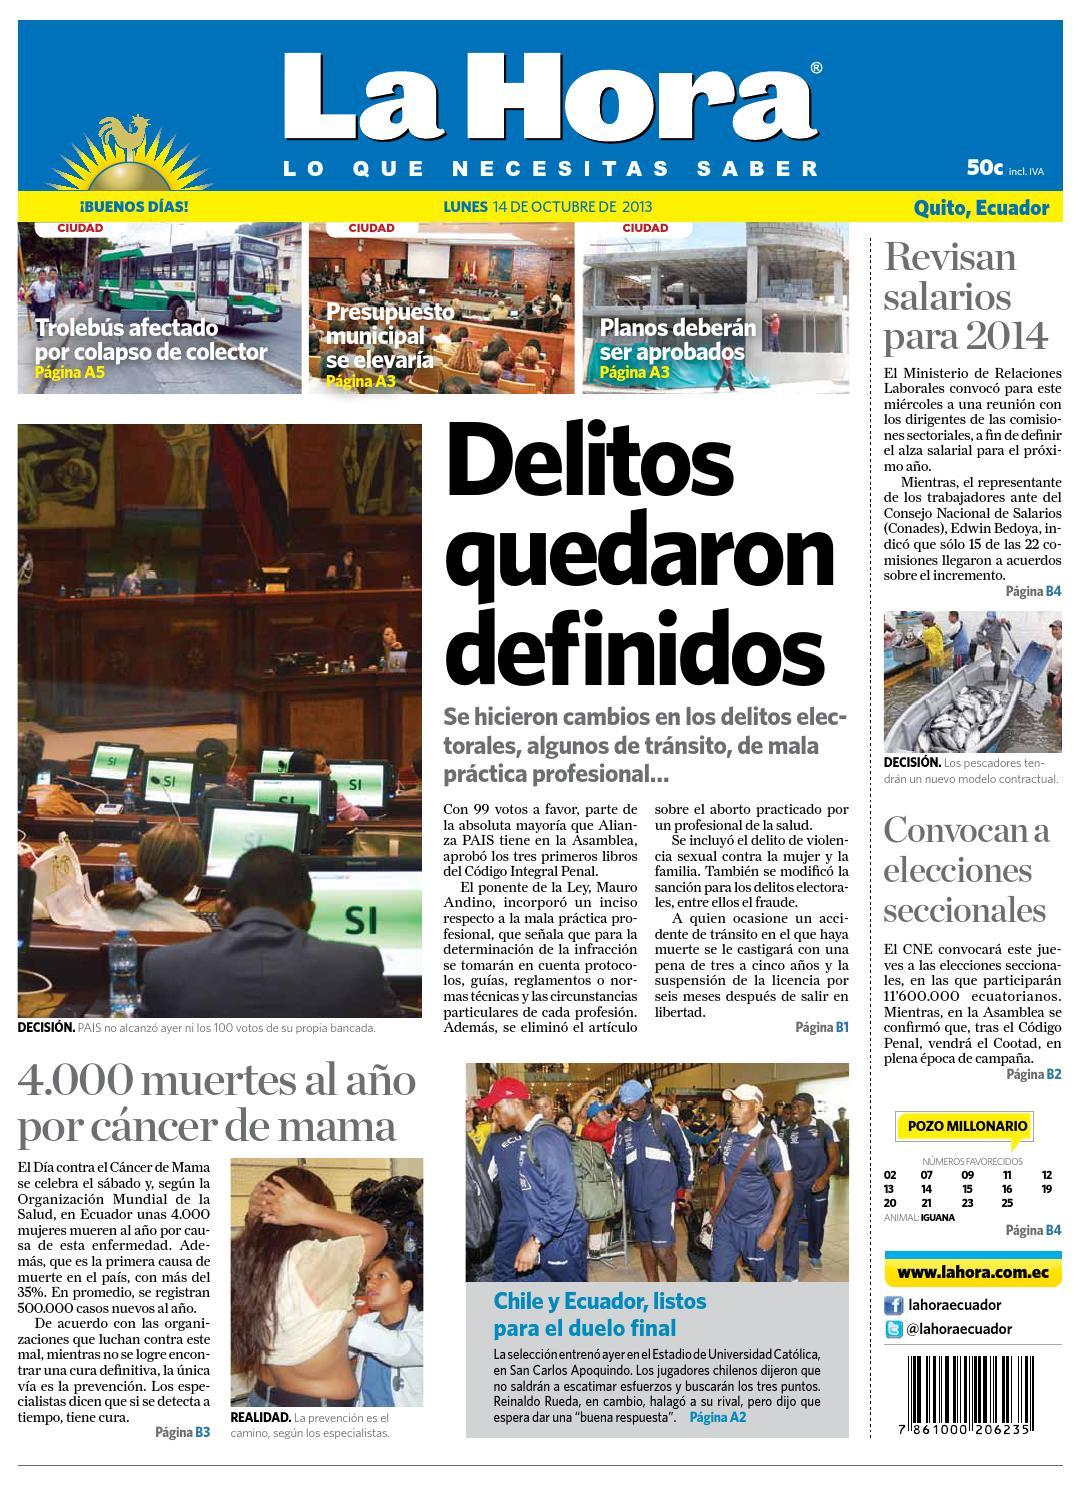 La Hora Quito 14 octubre 2013 by Diario La Hora Ecuador - issuu 6a8c7d3de3d